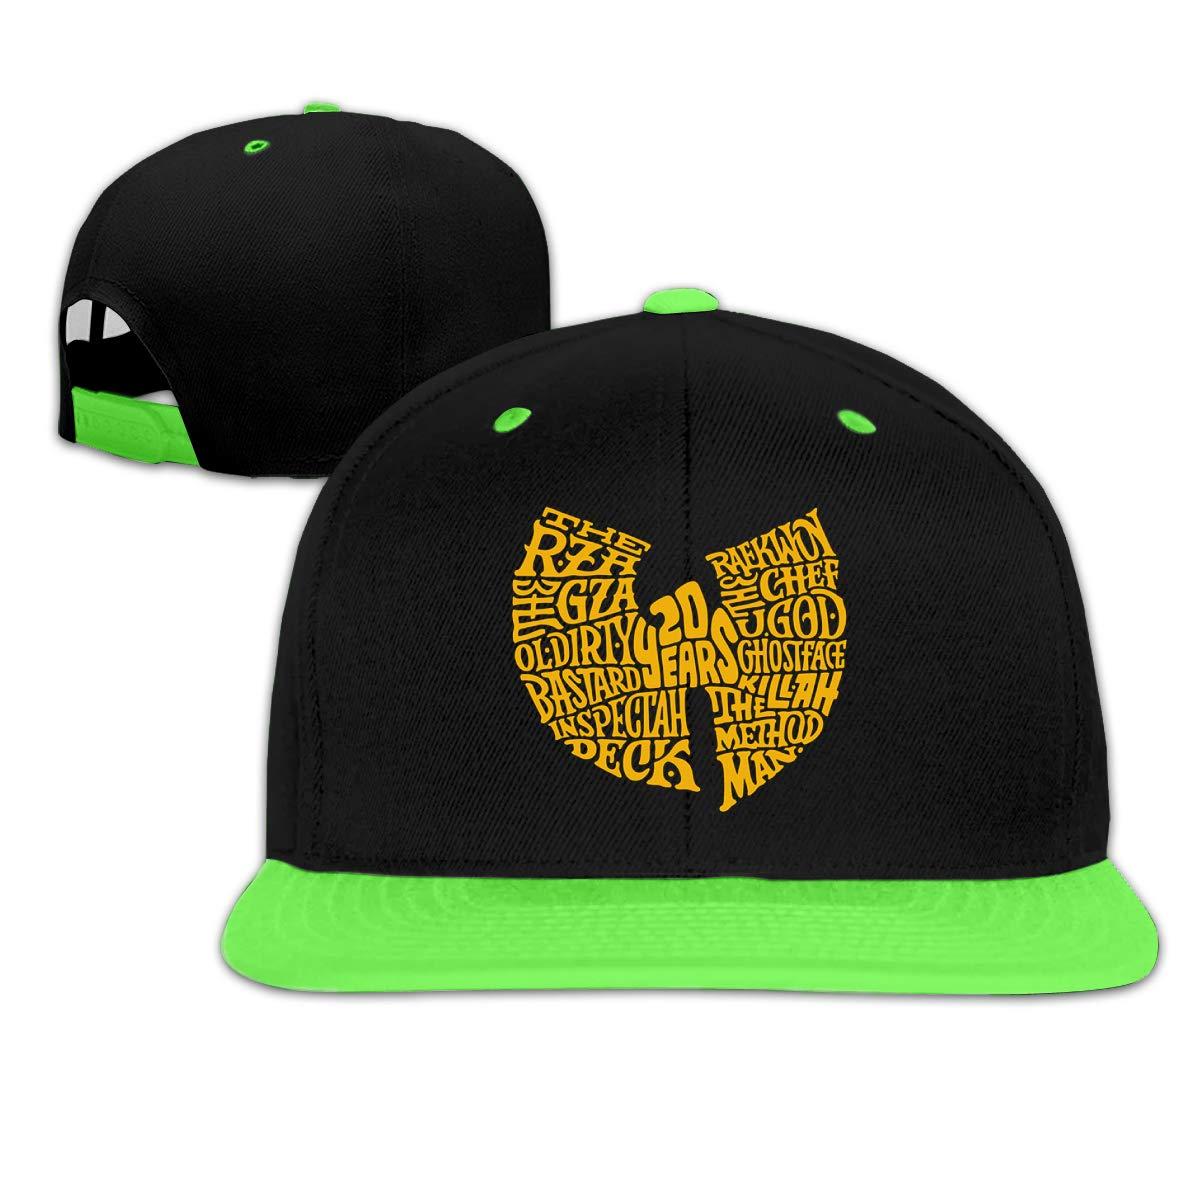 Arbitrary SHOP Wu-Tang Clan 20th Childrens Boy Girls Contrast Hip Hop Baseball Caps Denim Hats